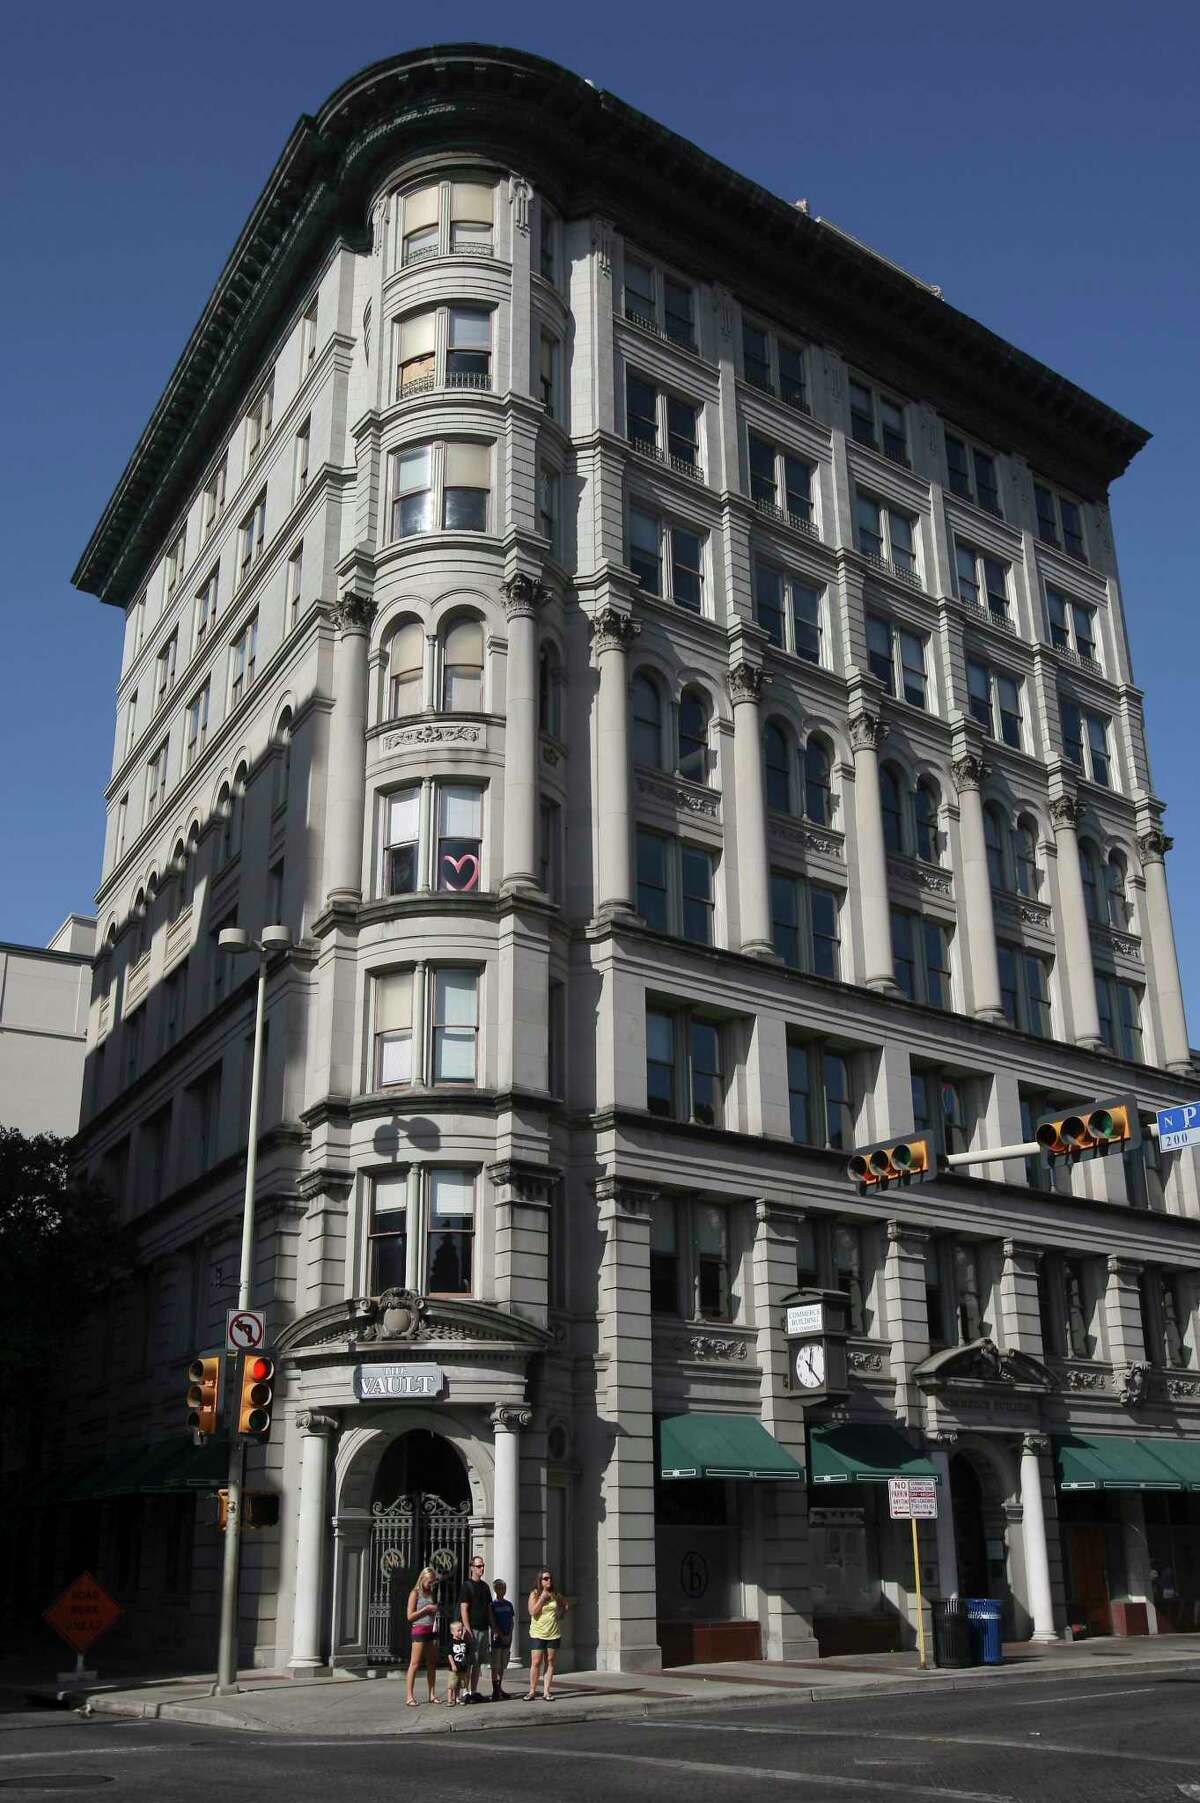 Commerce Building, August 1, 2012 at 314 Commerce St.